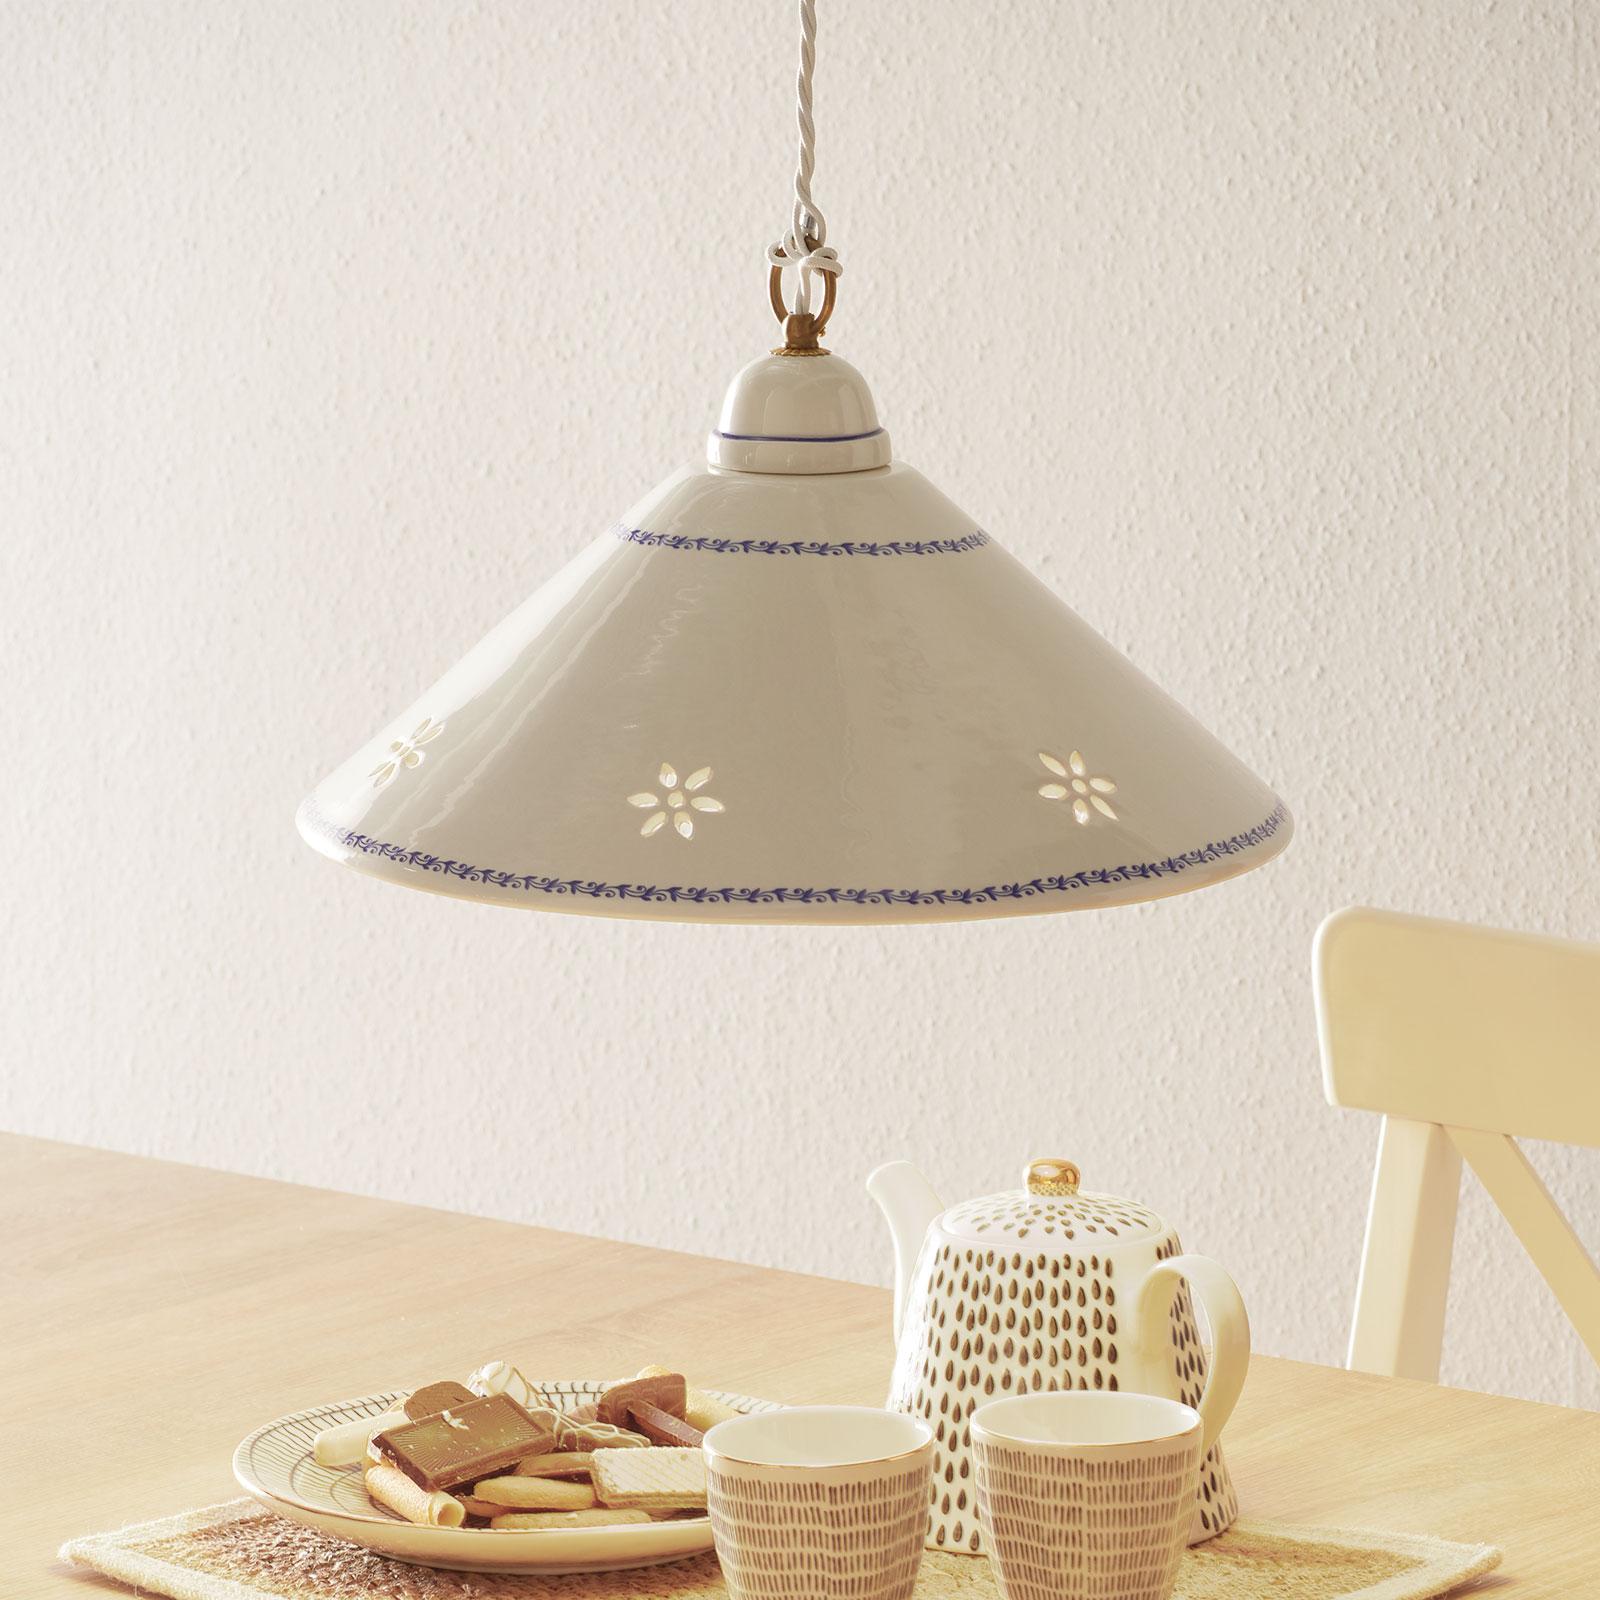 Witte hanglamp NONNA van keramiek, 40 cm